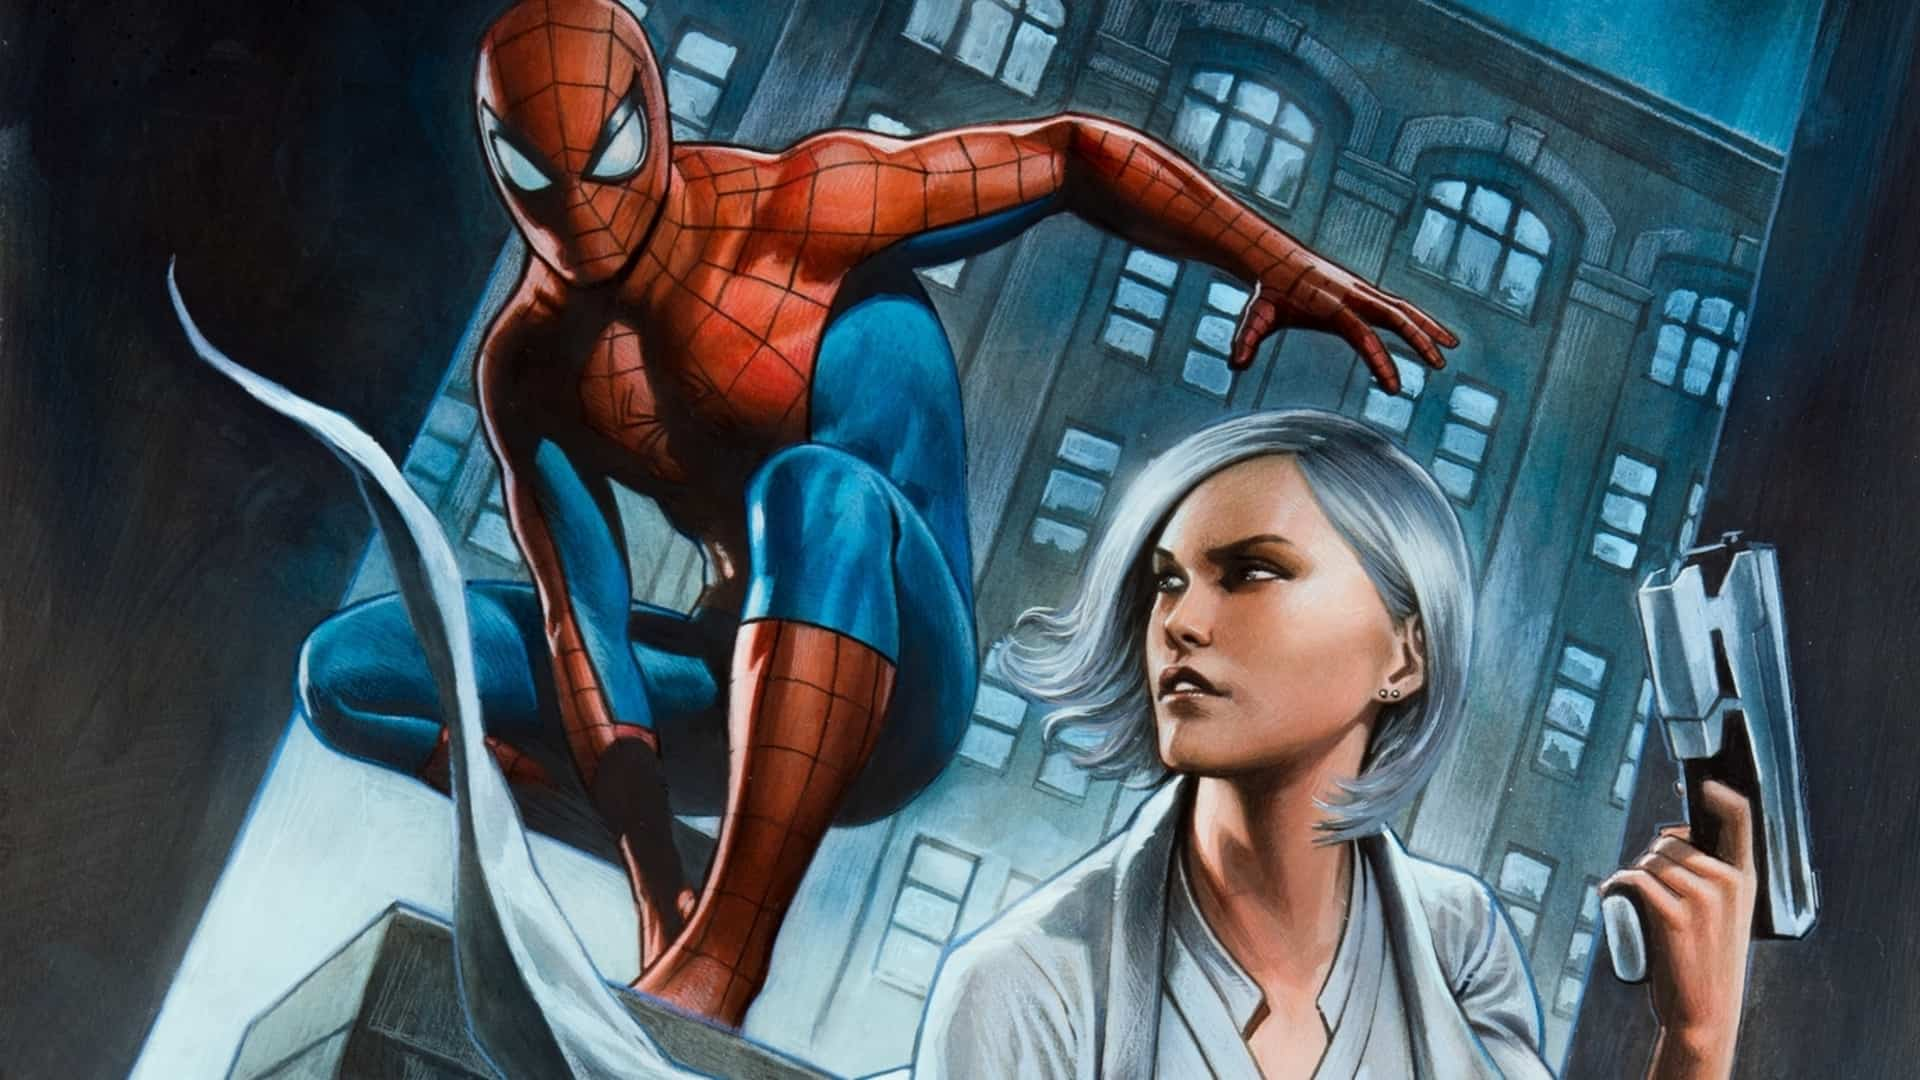 Marvel's Spider-Man Silver Linings DLC arrives December 2019